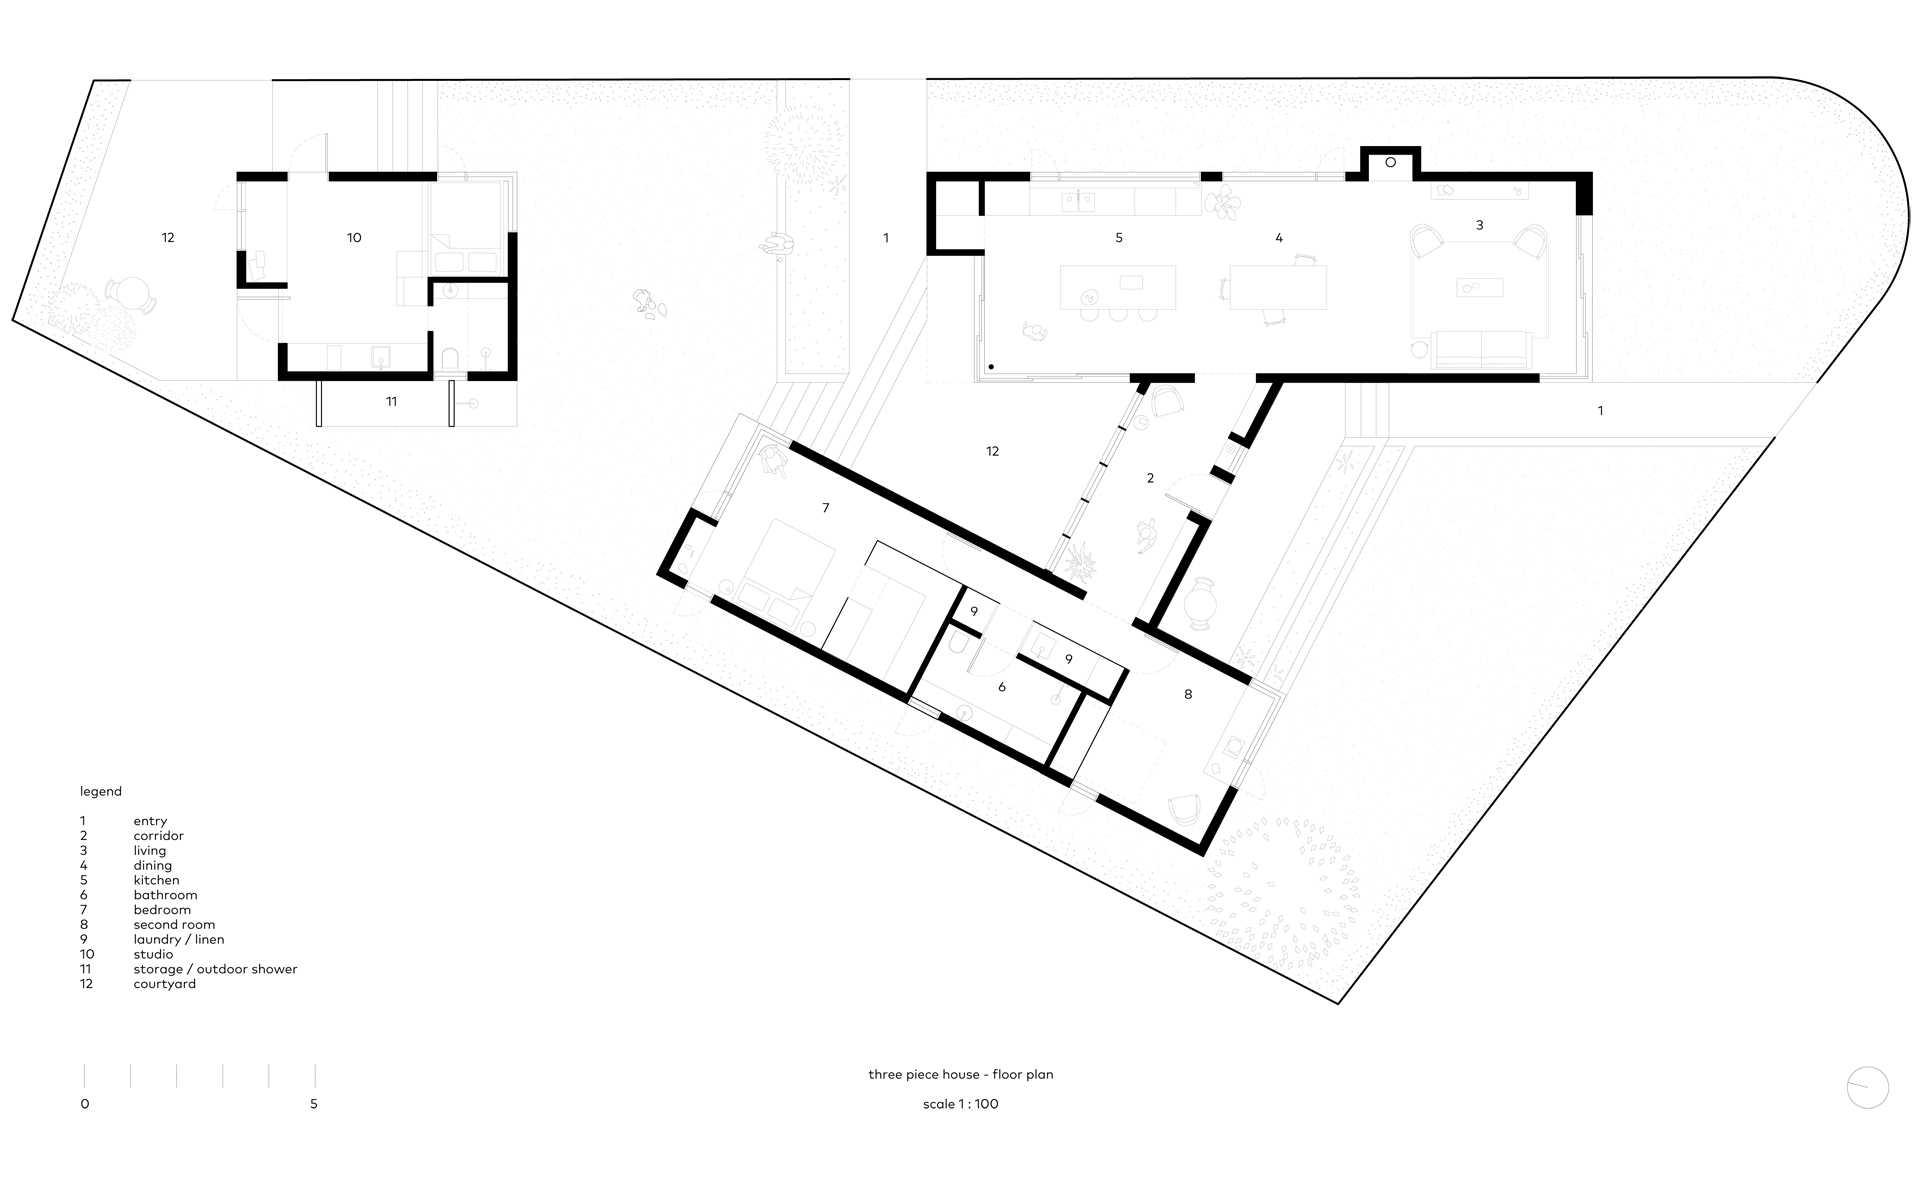 Three Piece House  - 29 9 51